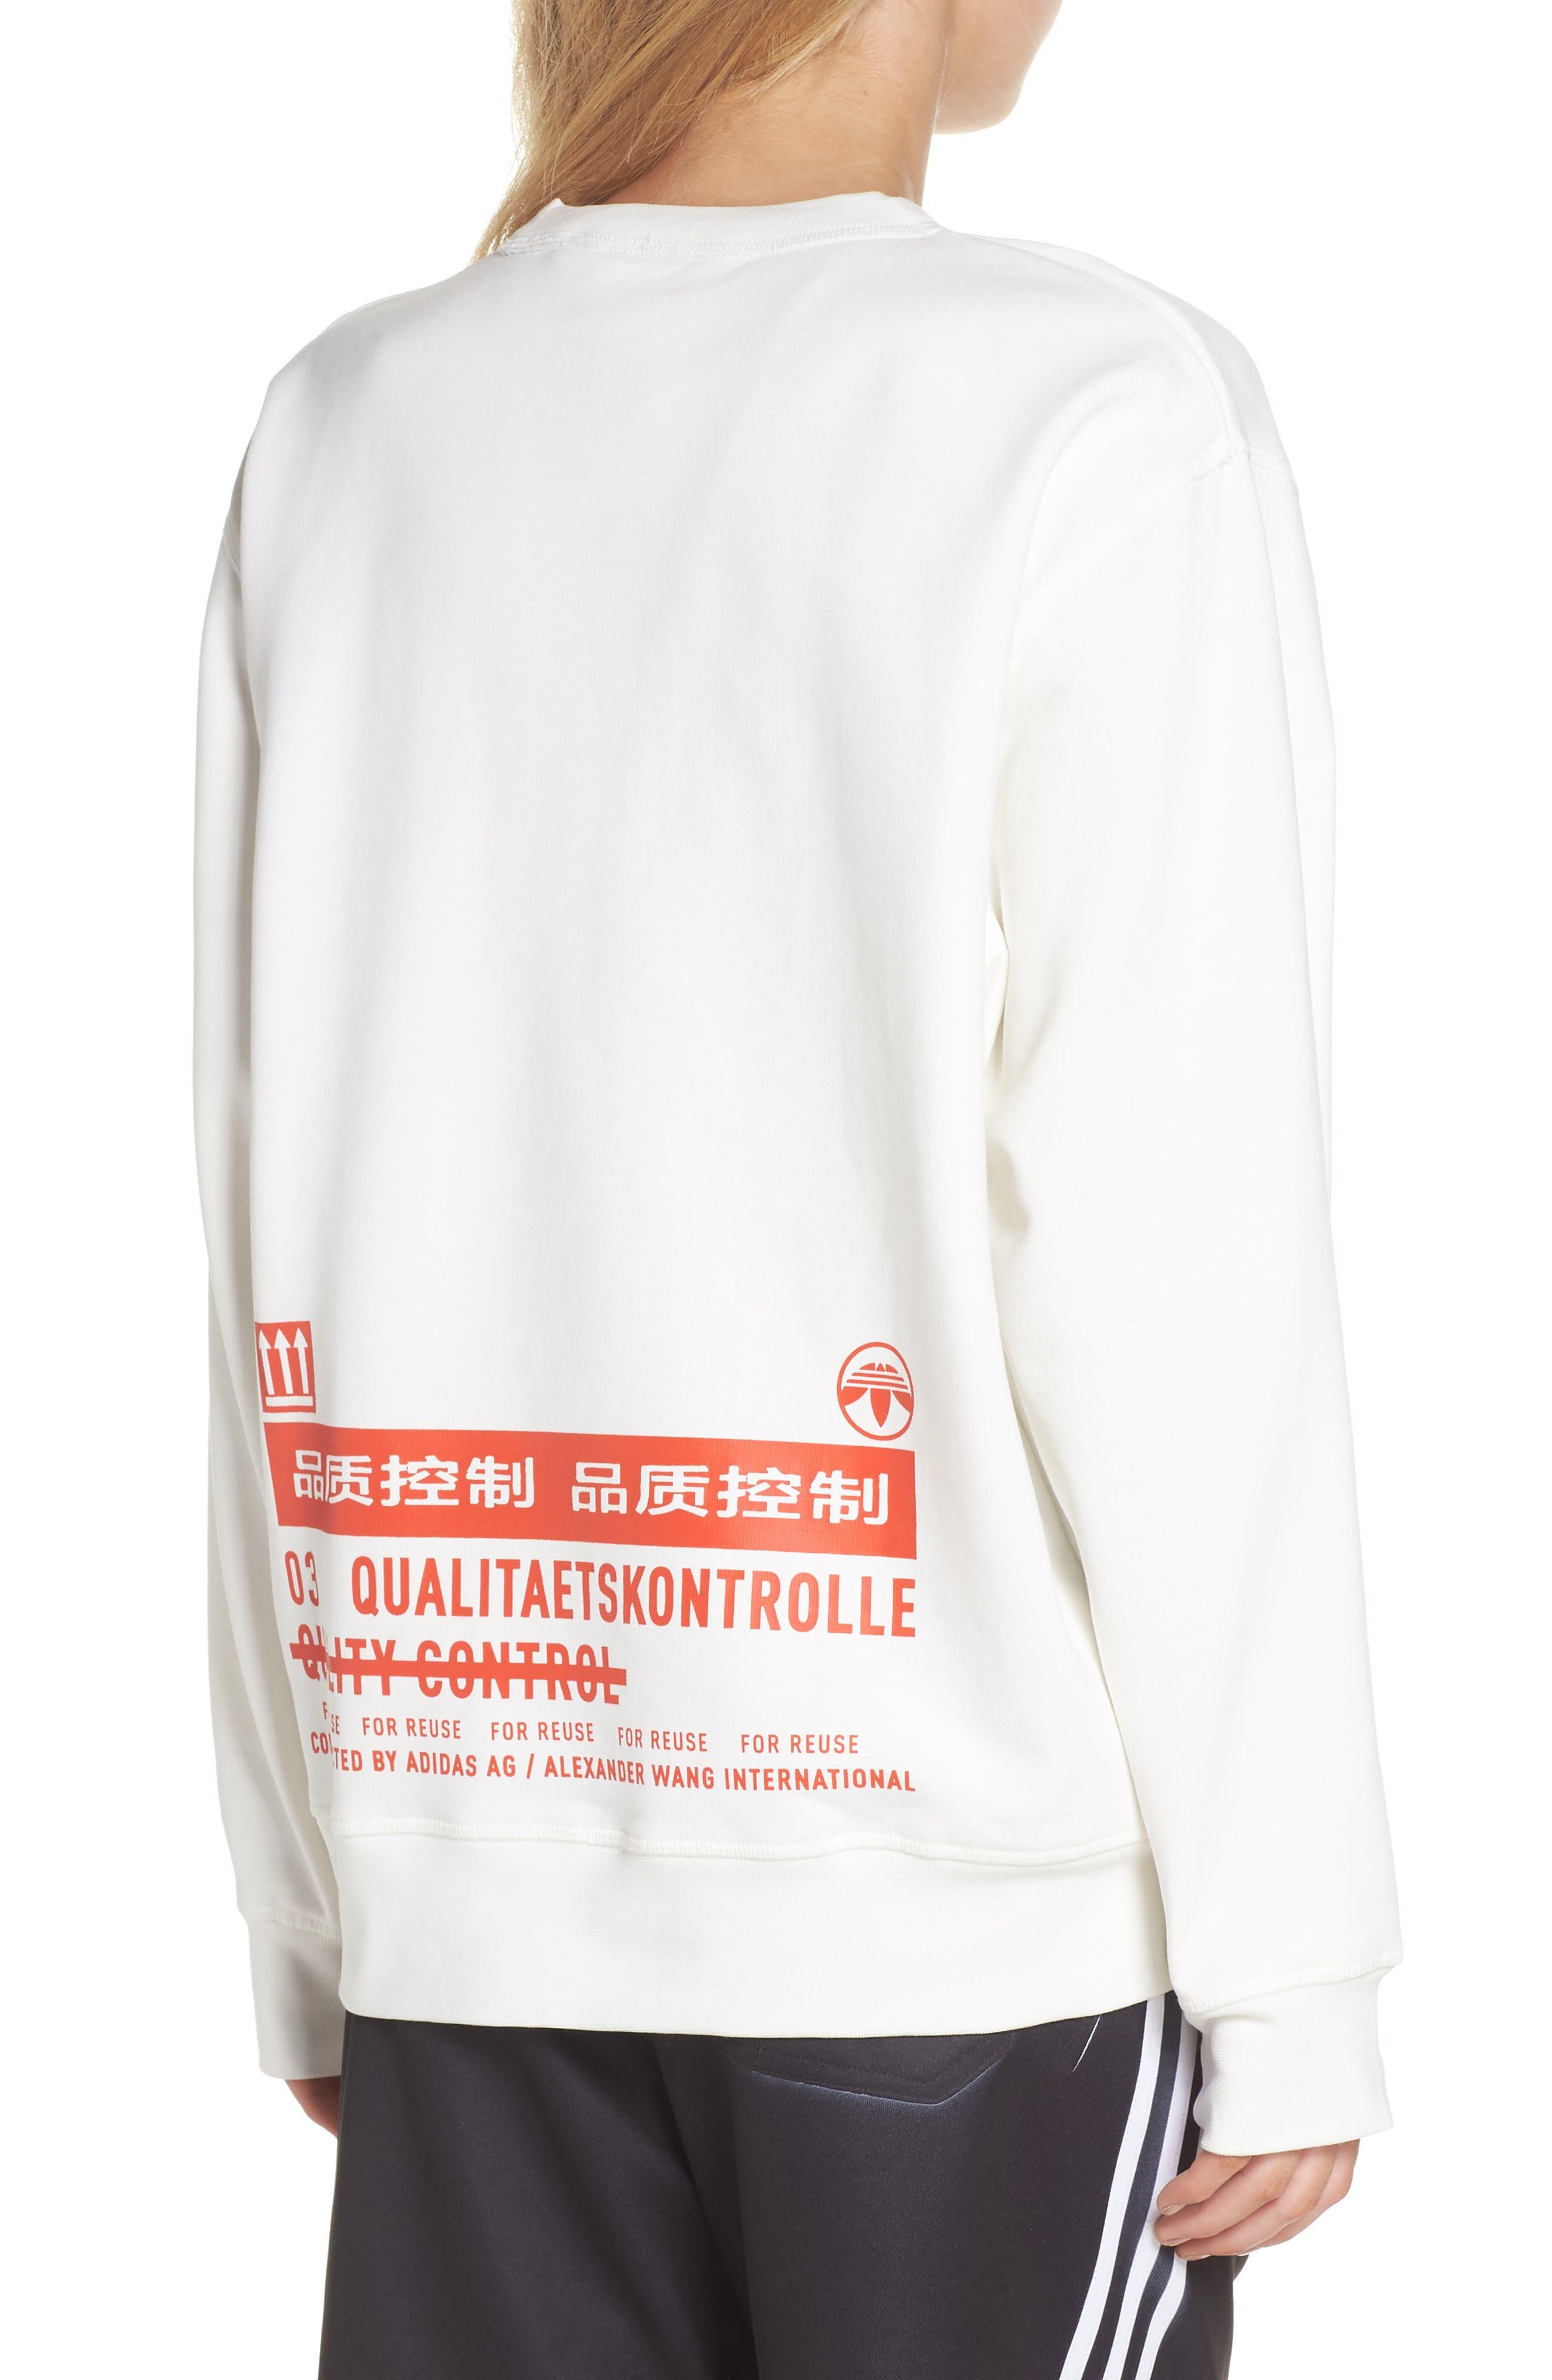 adidas x Alexander Wang Graphite Sweatshirt,                             Alternate thumbnail 2, color,                             900